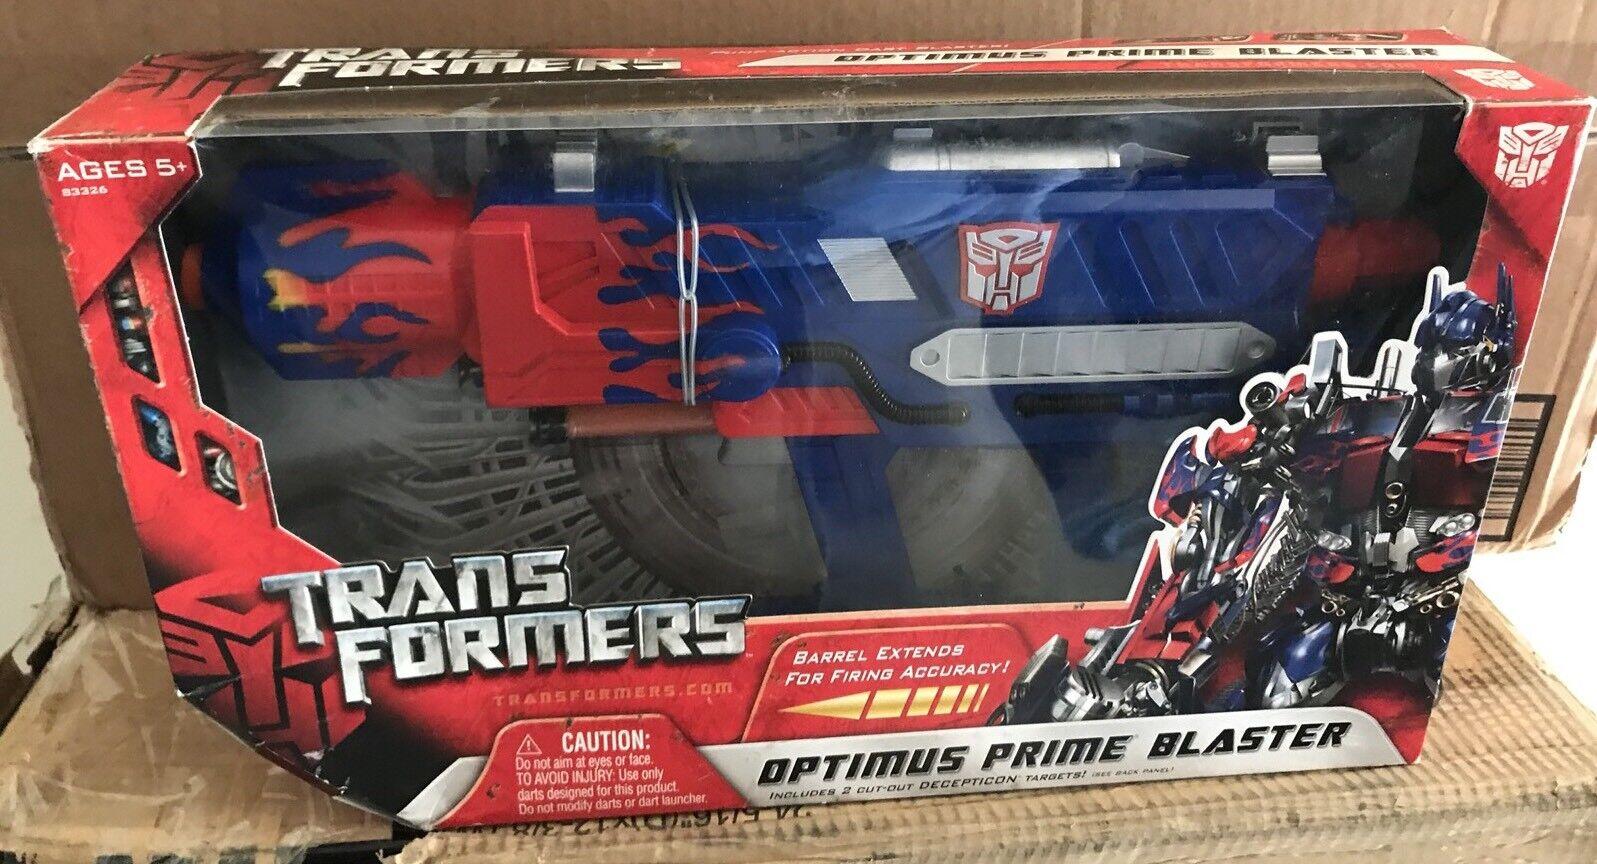 TRANSFORMERS Movie Role Play Optimus Prime Blaster MIB 100% Comp. 2007